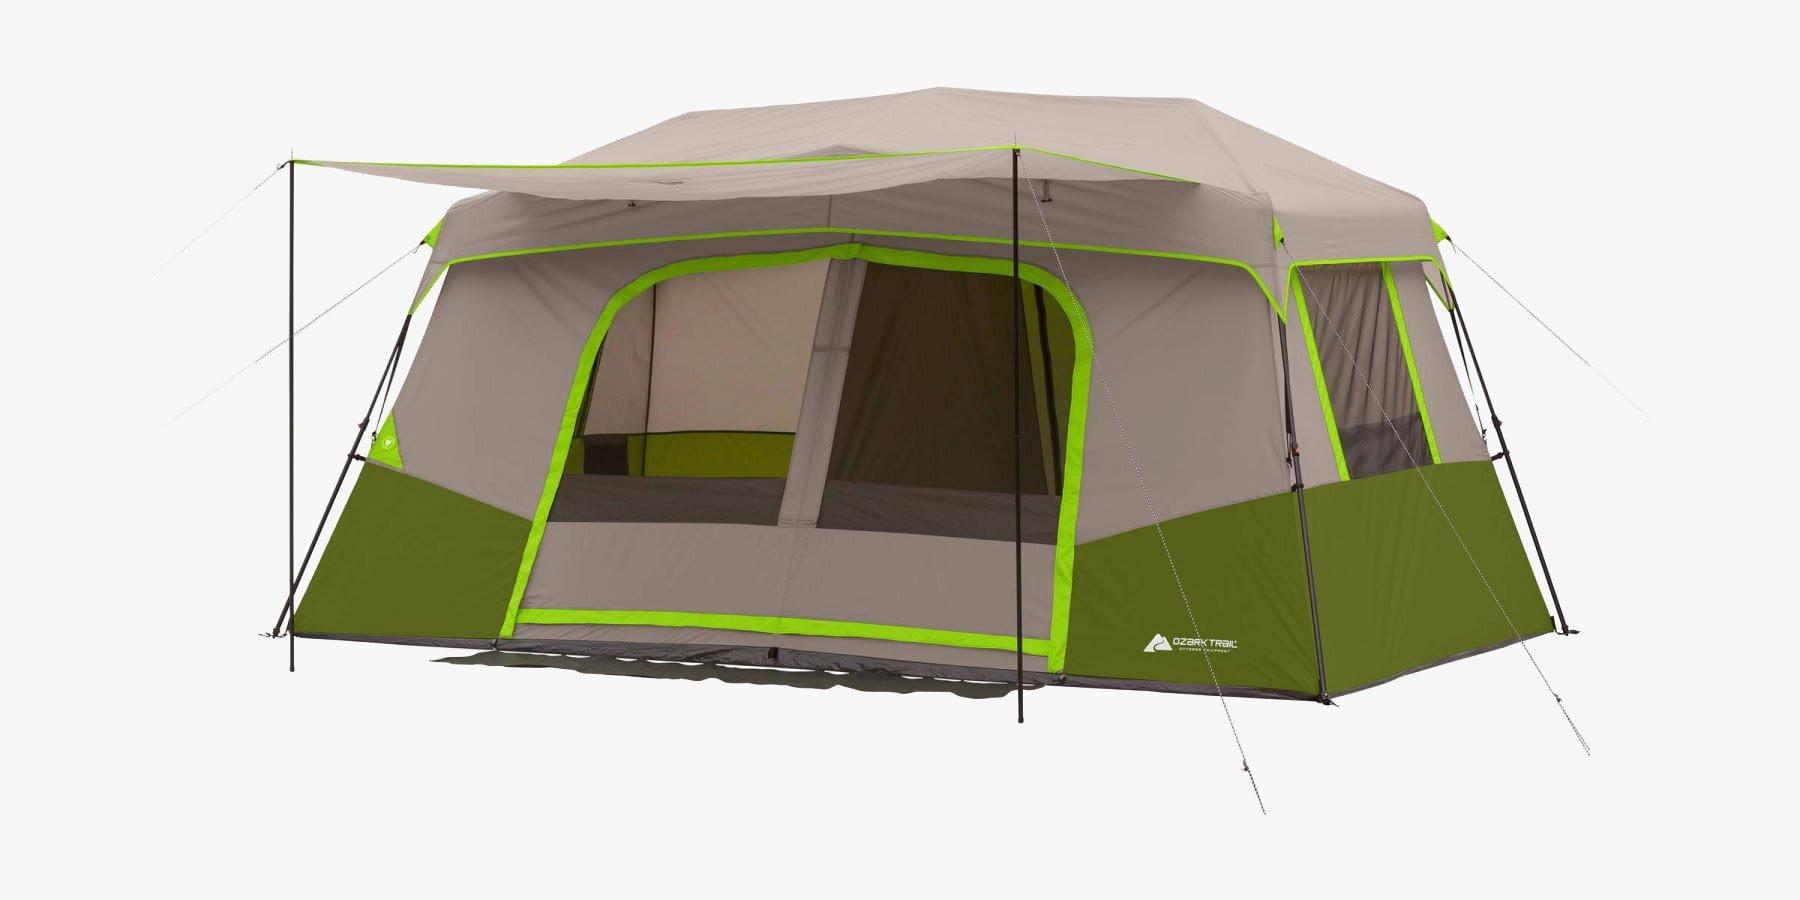 Ozark Trail 3-room instant cabin tent